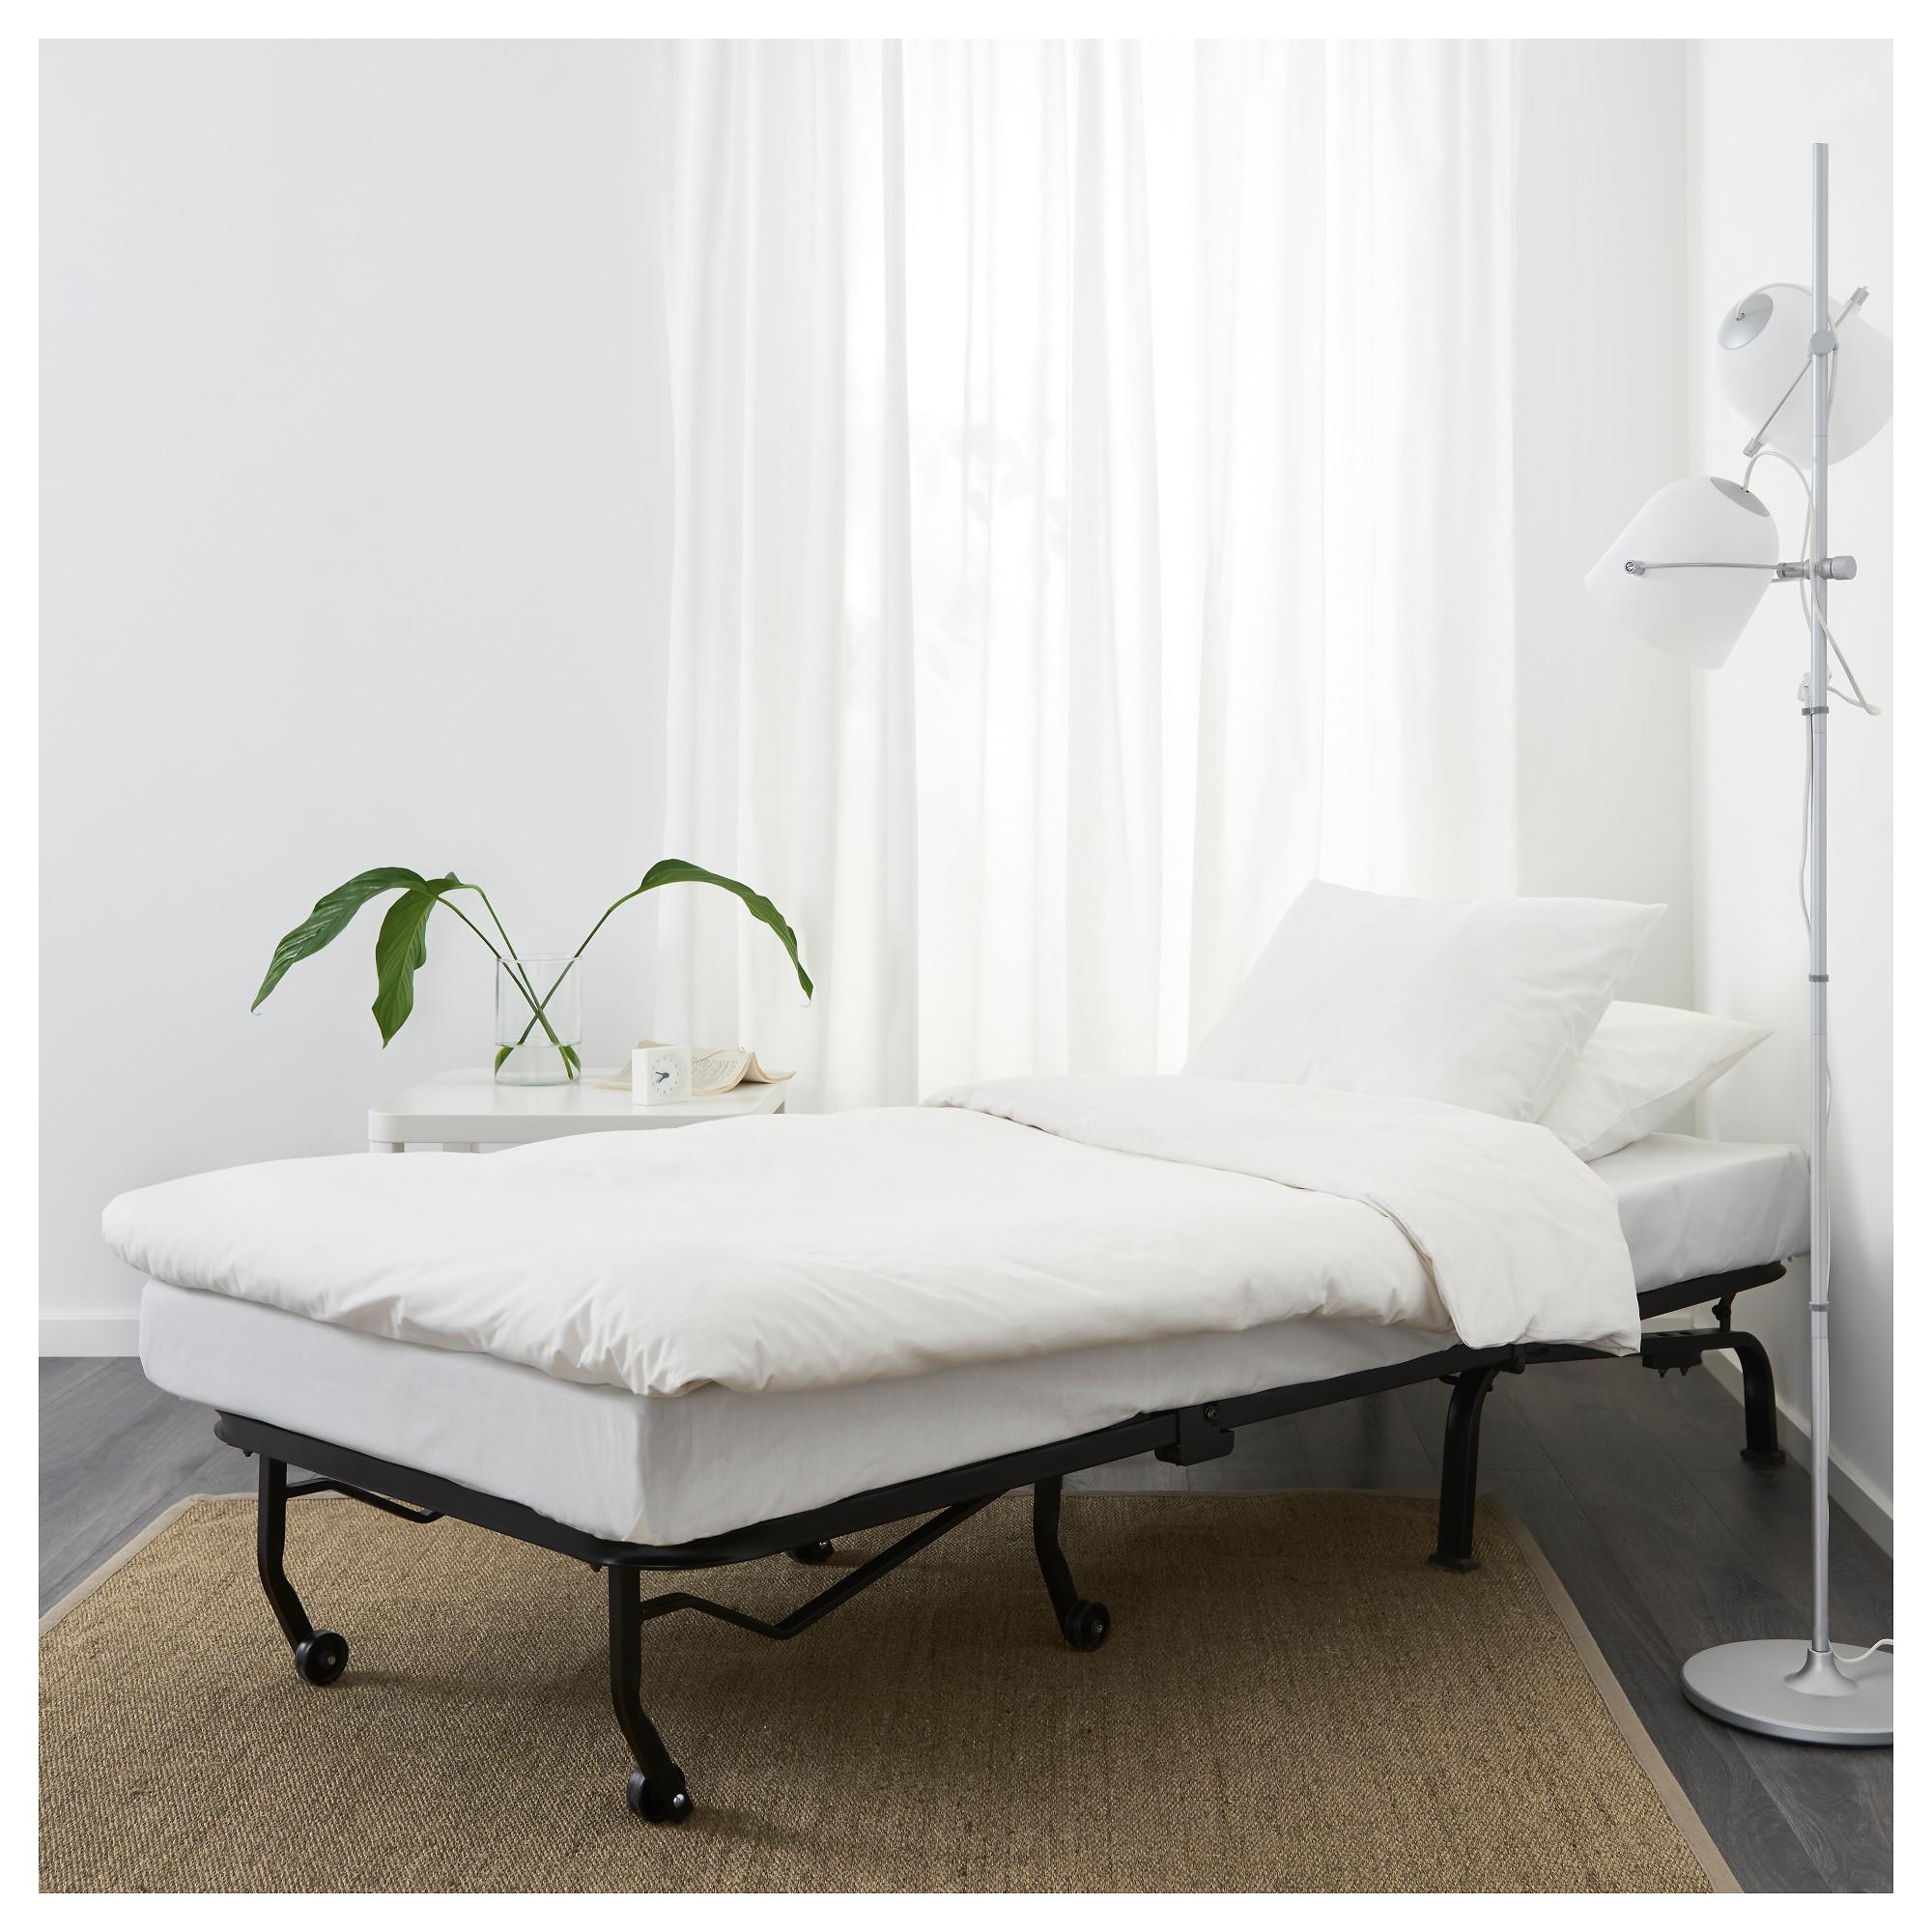 Fantastic Lycksele Lovas Chair Bed Vallarum Grey Ikea Hong Kong Inzonedesignstudio Interior Chair Design Inzonedesignstudiocom